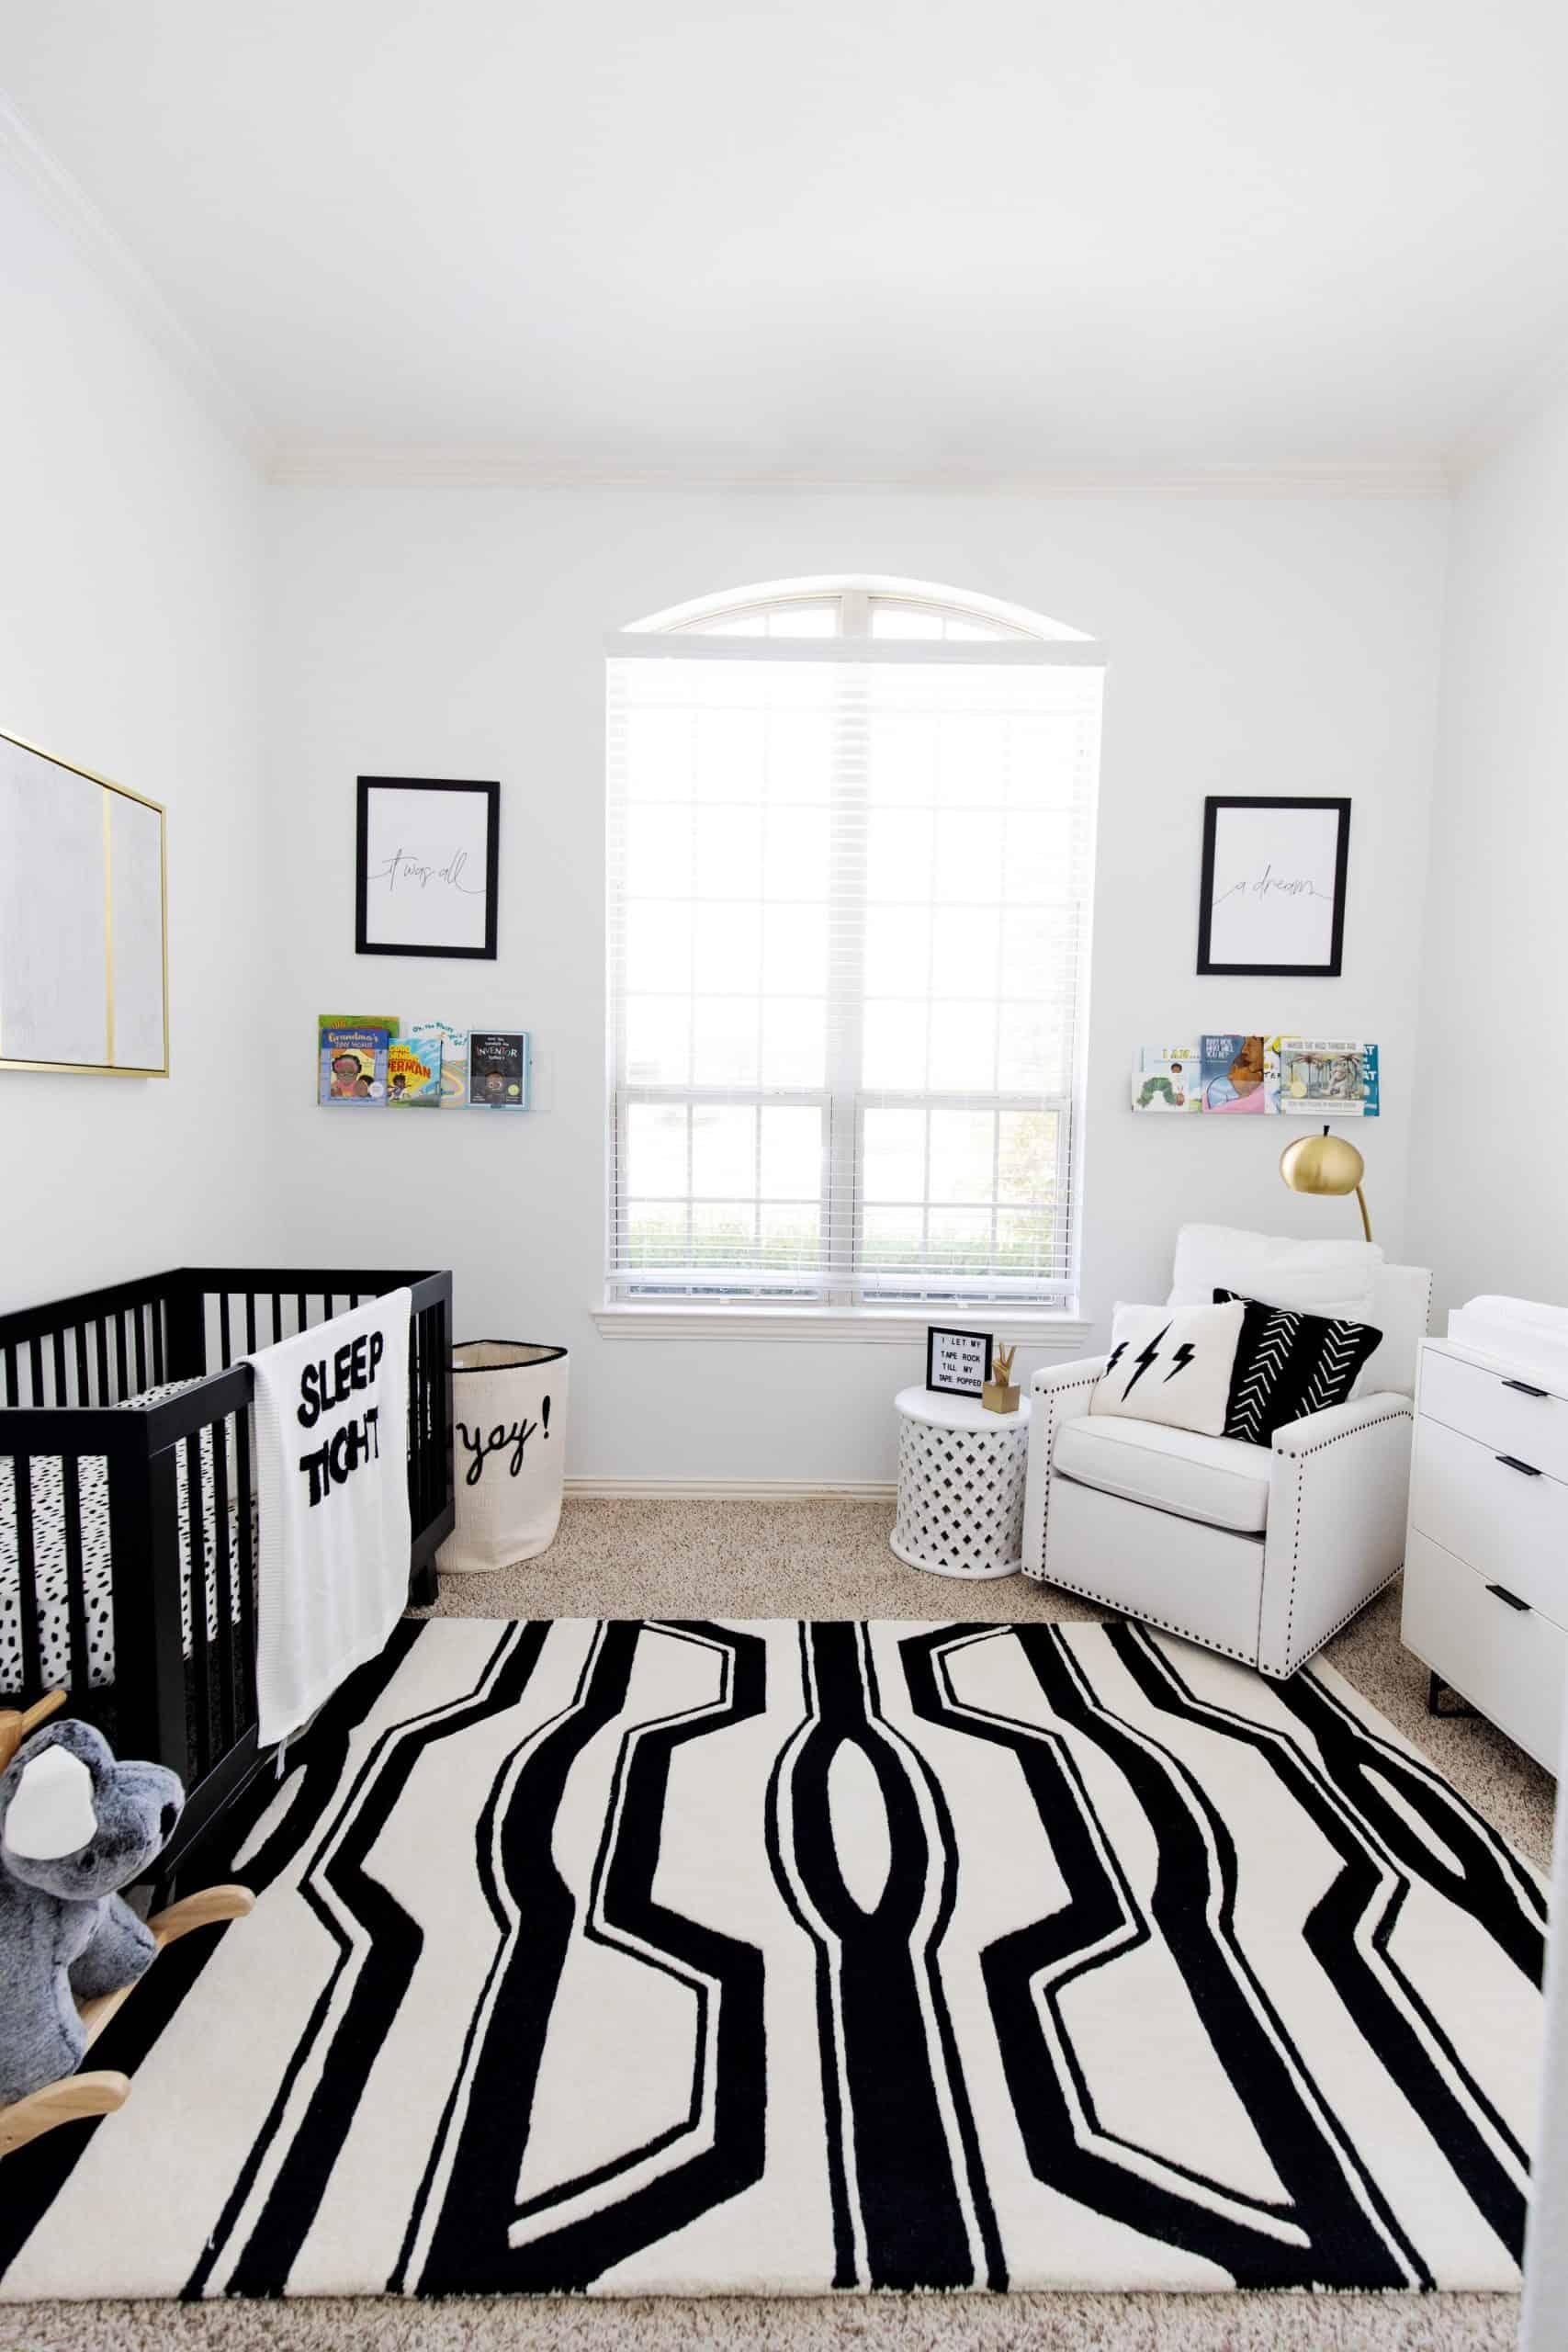 Pottery Barn Baby Registry by popular Dallas motherhood blog, Glamorous Versatility: image of a modern black and white baby nursery.